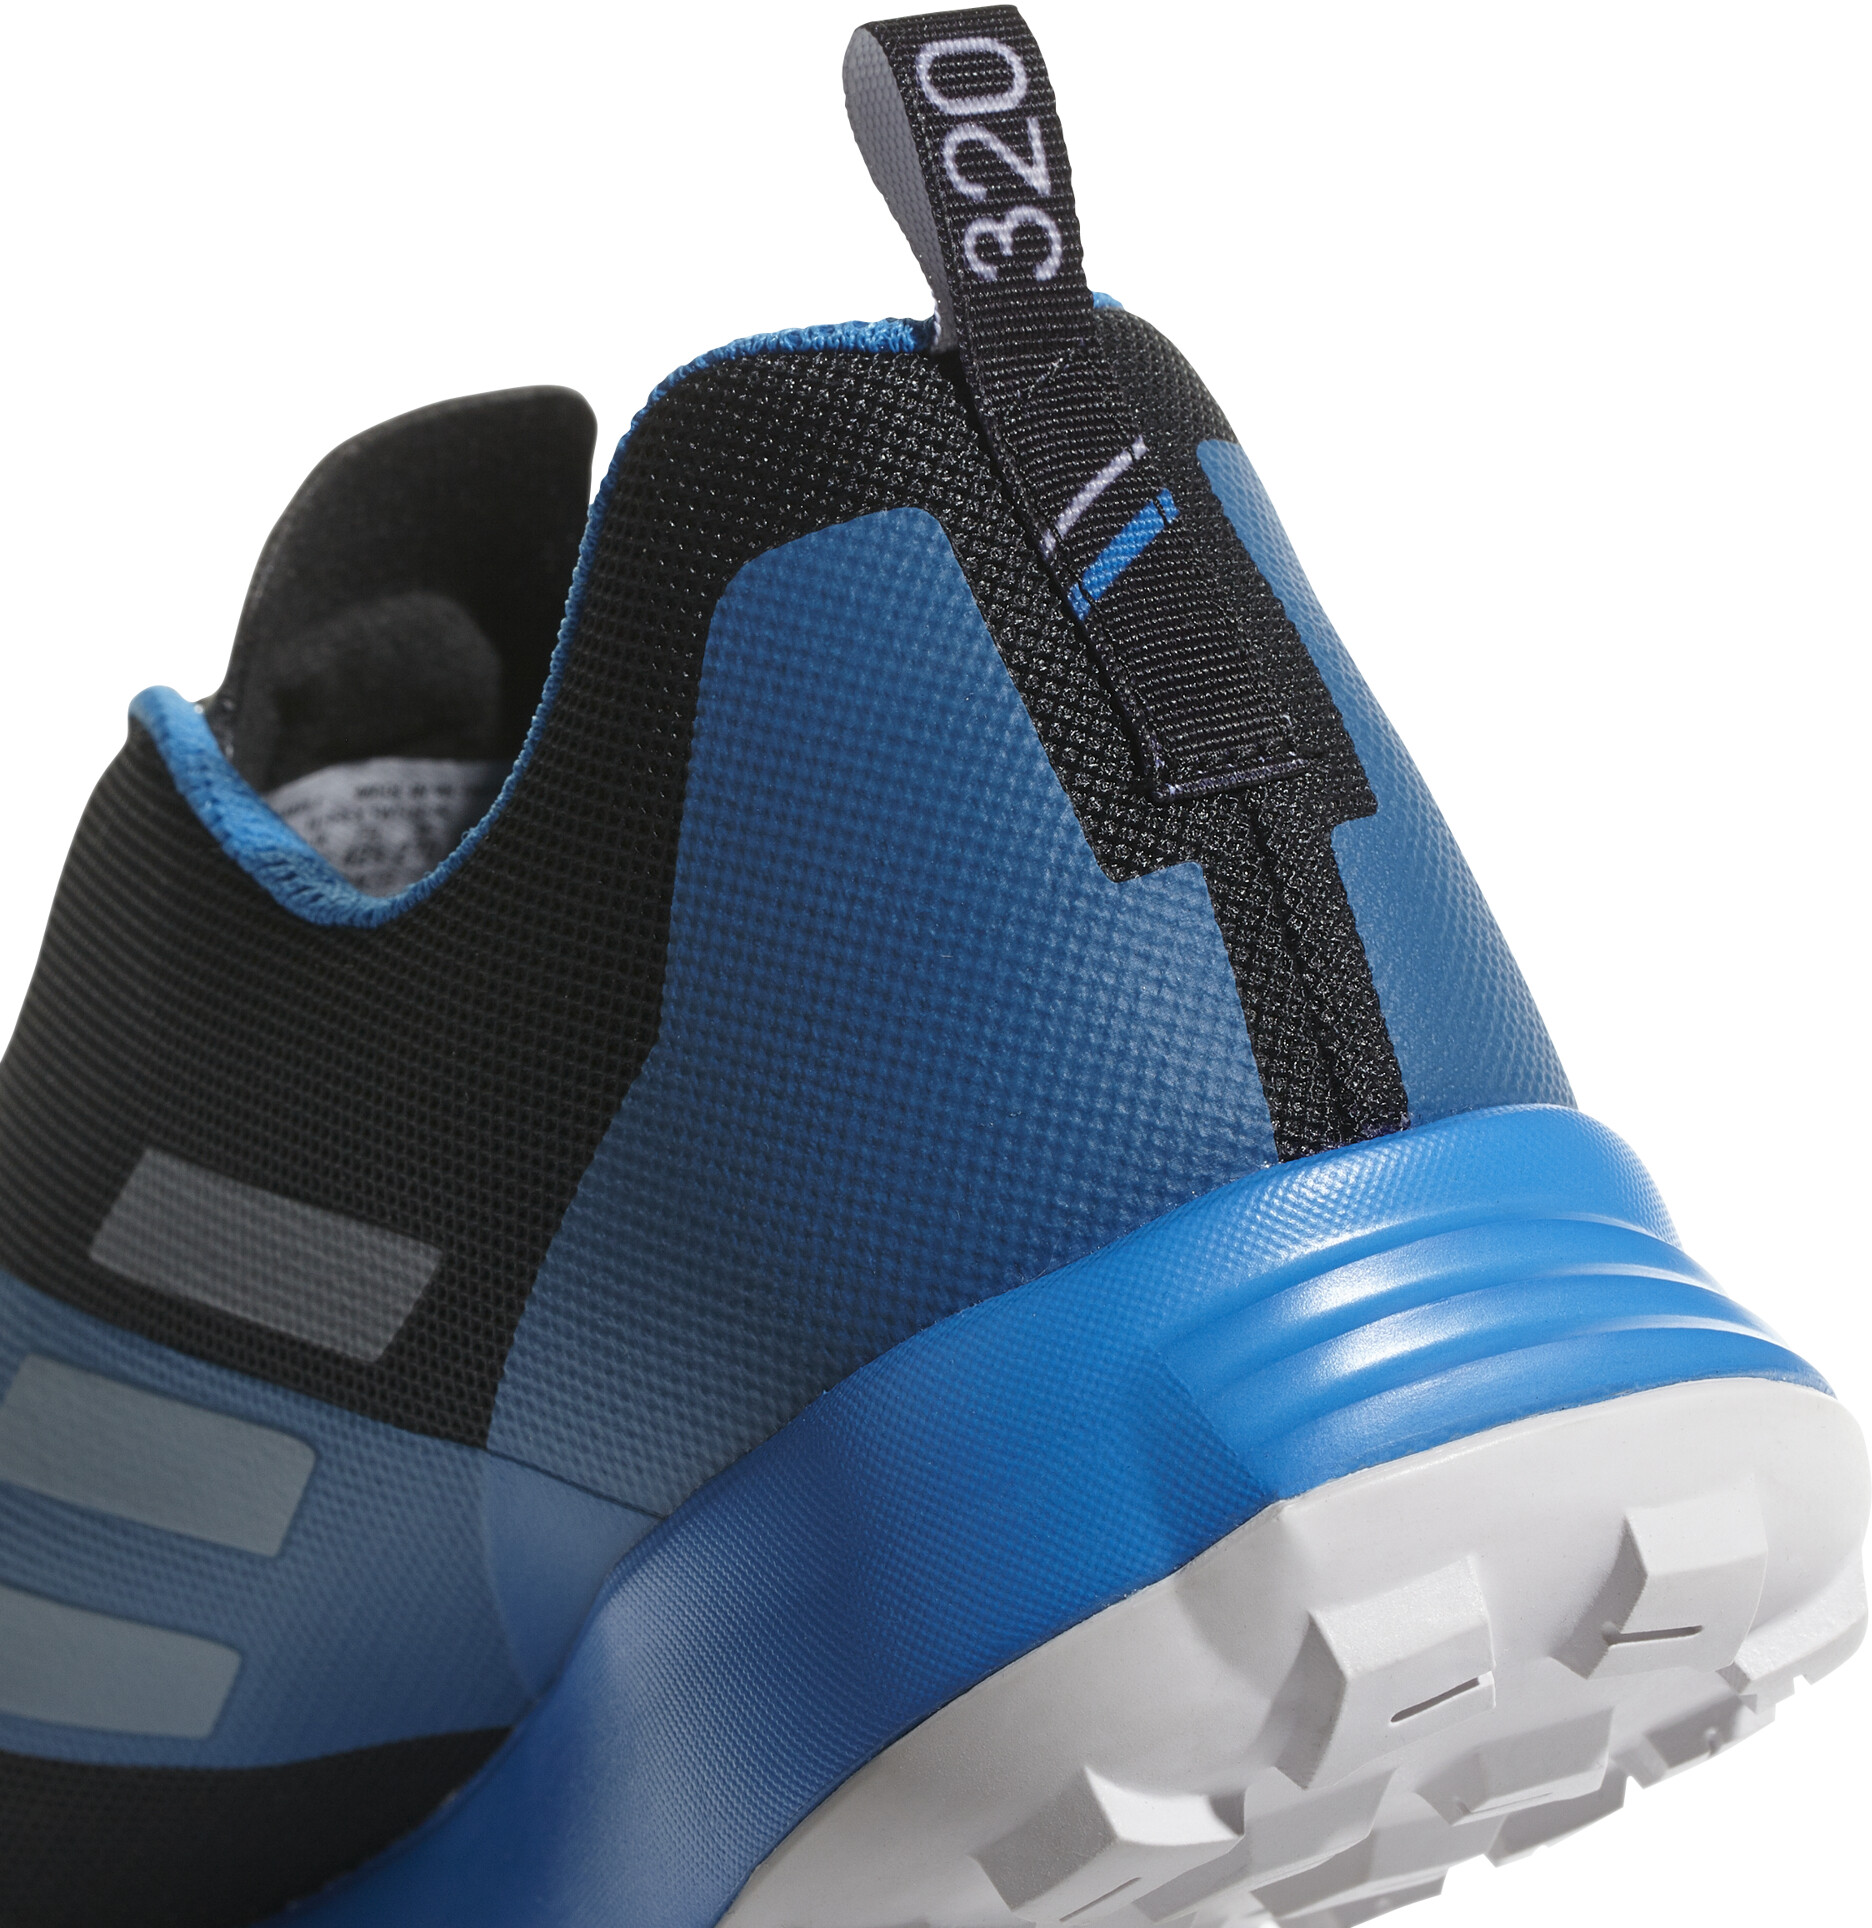 wholesale dealer e8ee7 fa33b adidas TERREX Two Boa Running Shoes Men blue black